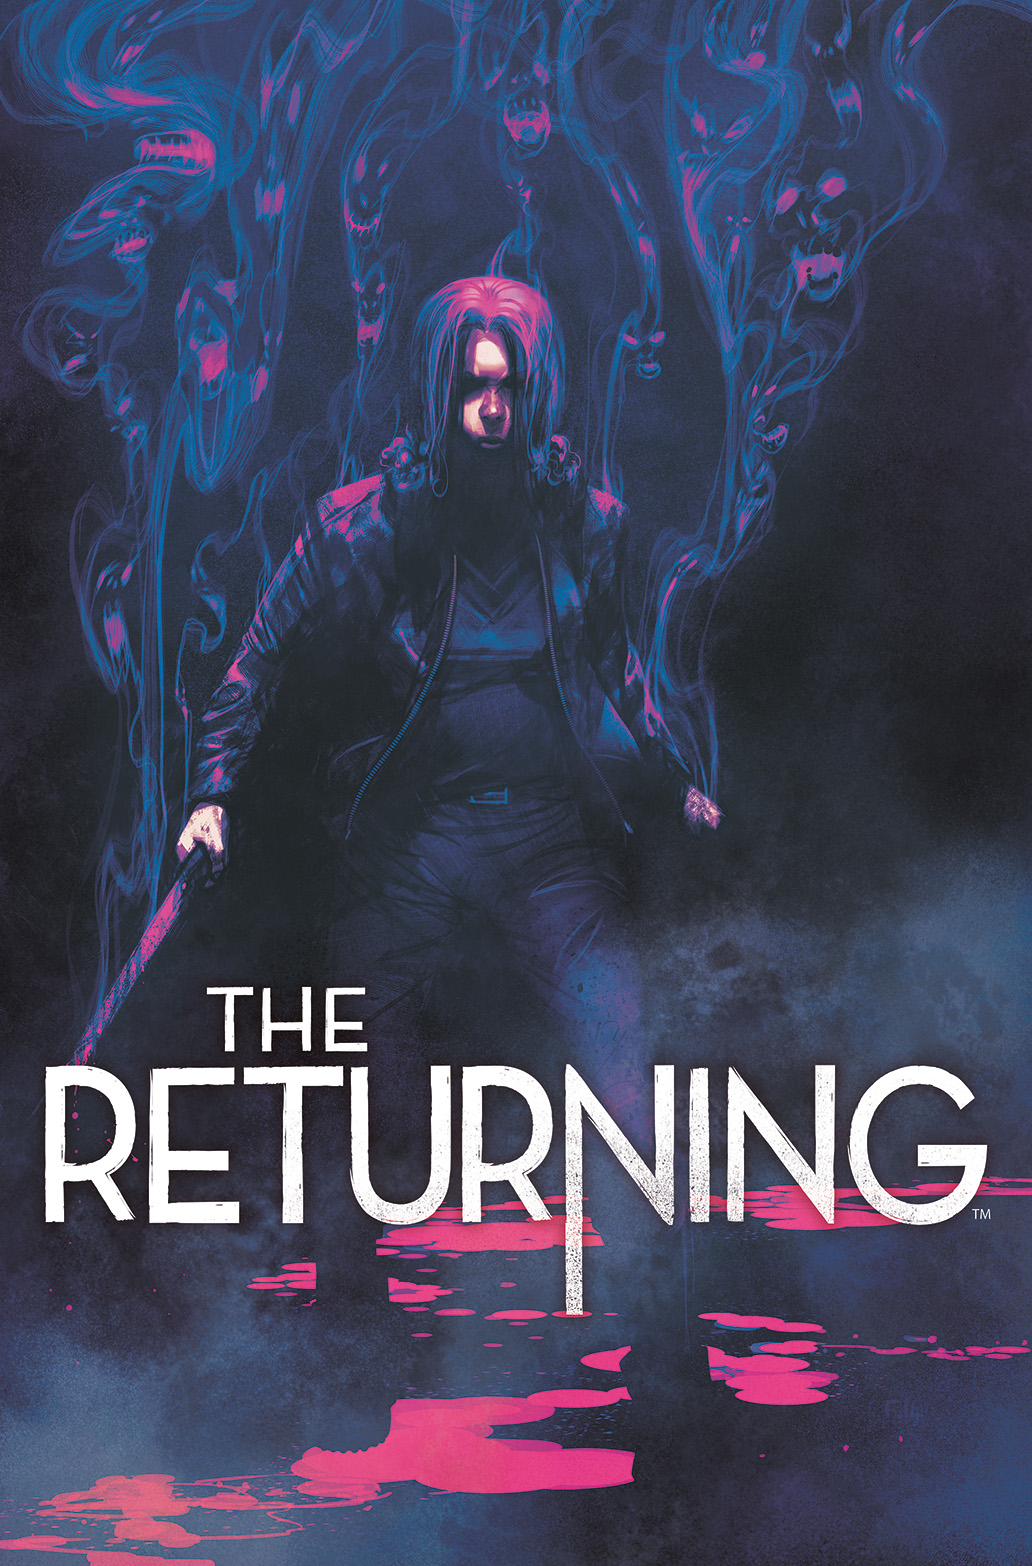 THE RETURNING #4 Cover by Frazer Irving